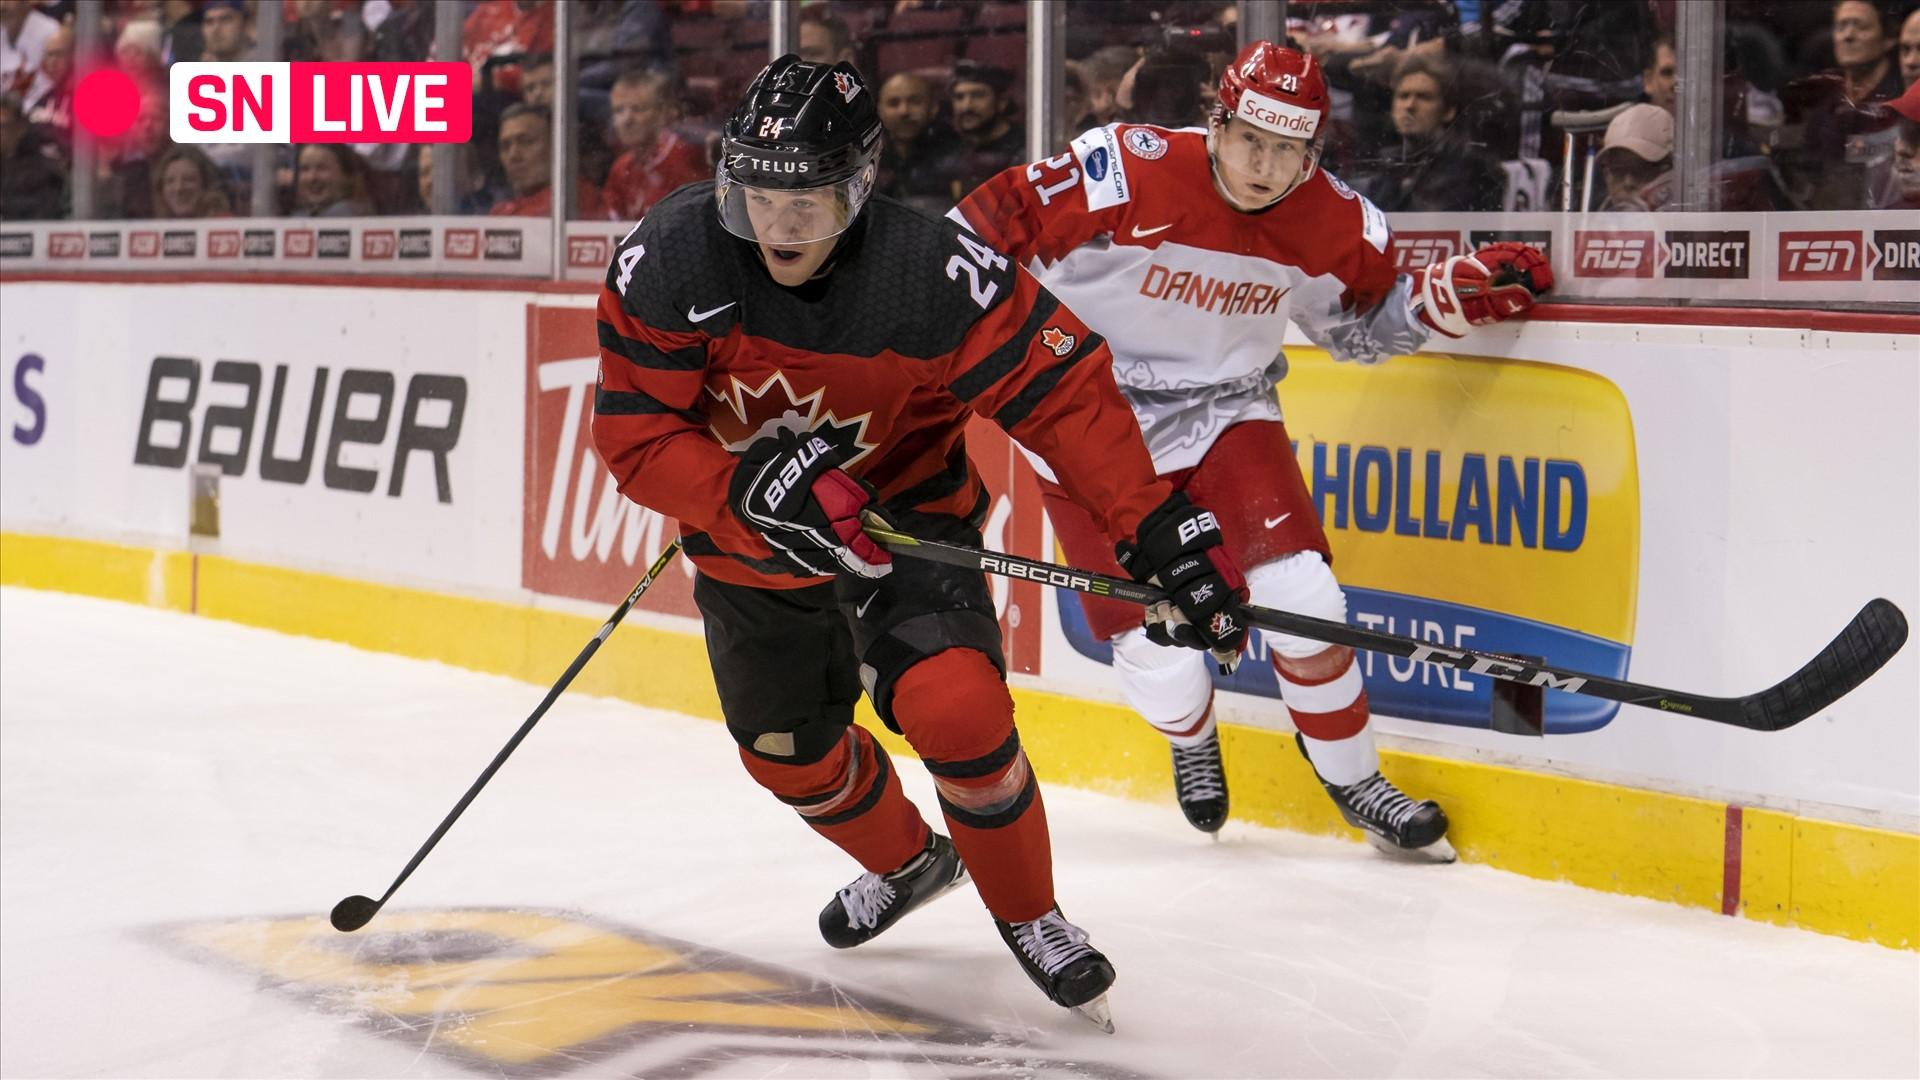 Canada vs. Czech Republic: Live scores, highlights, updates from 2020 World Juniors